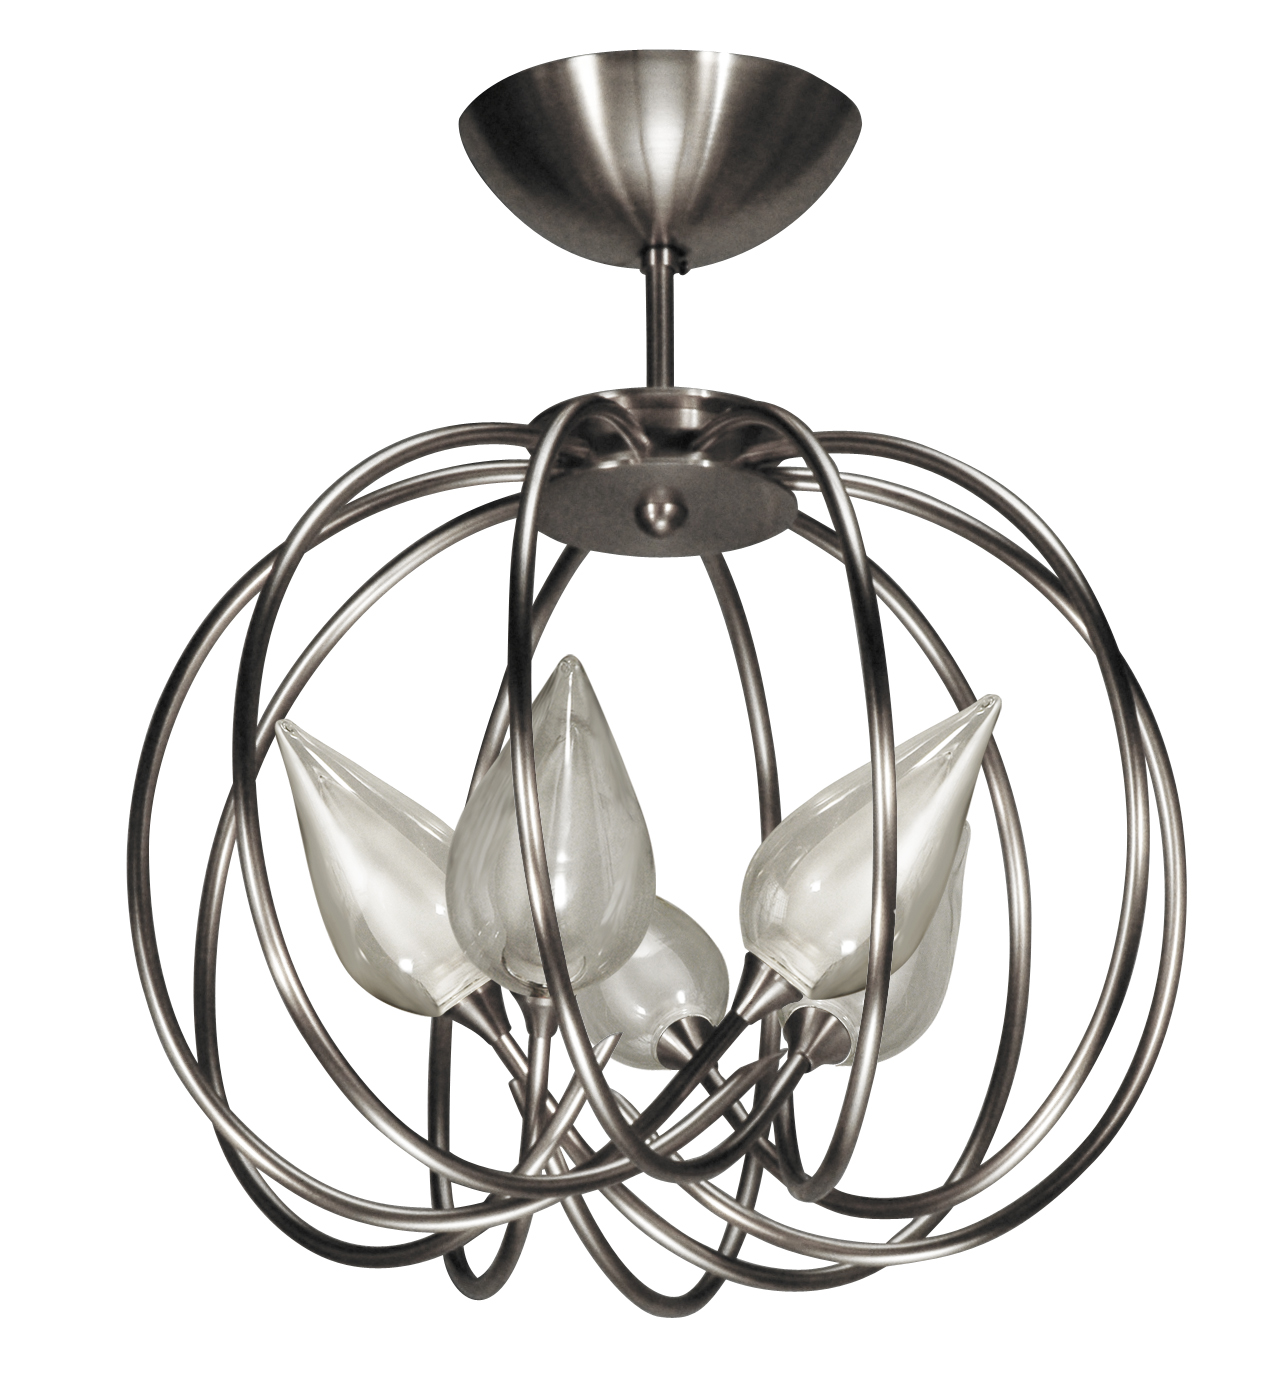 Satin Nickel Ceiling Light Fixtures: satin nickel ceiling lights photo - 3,Lighting